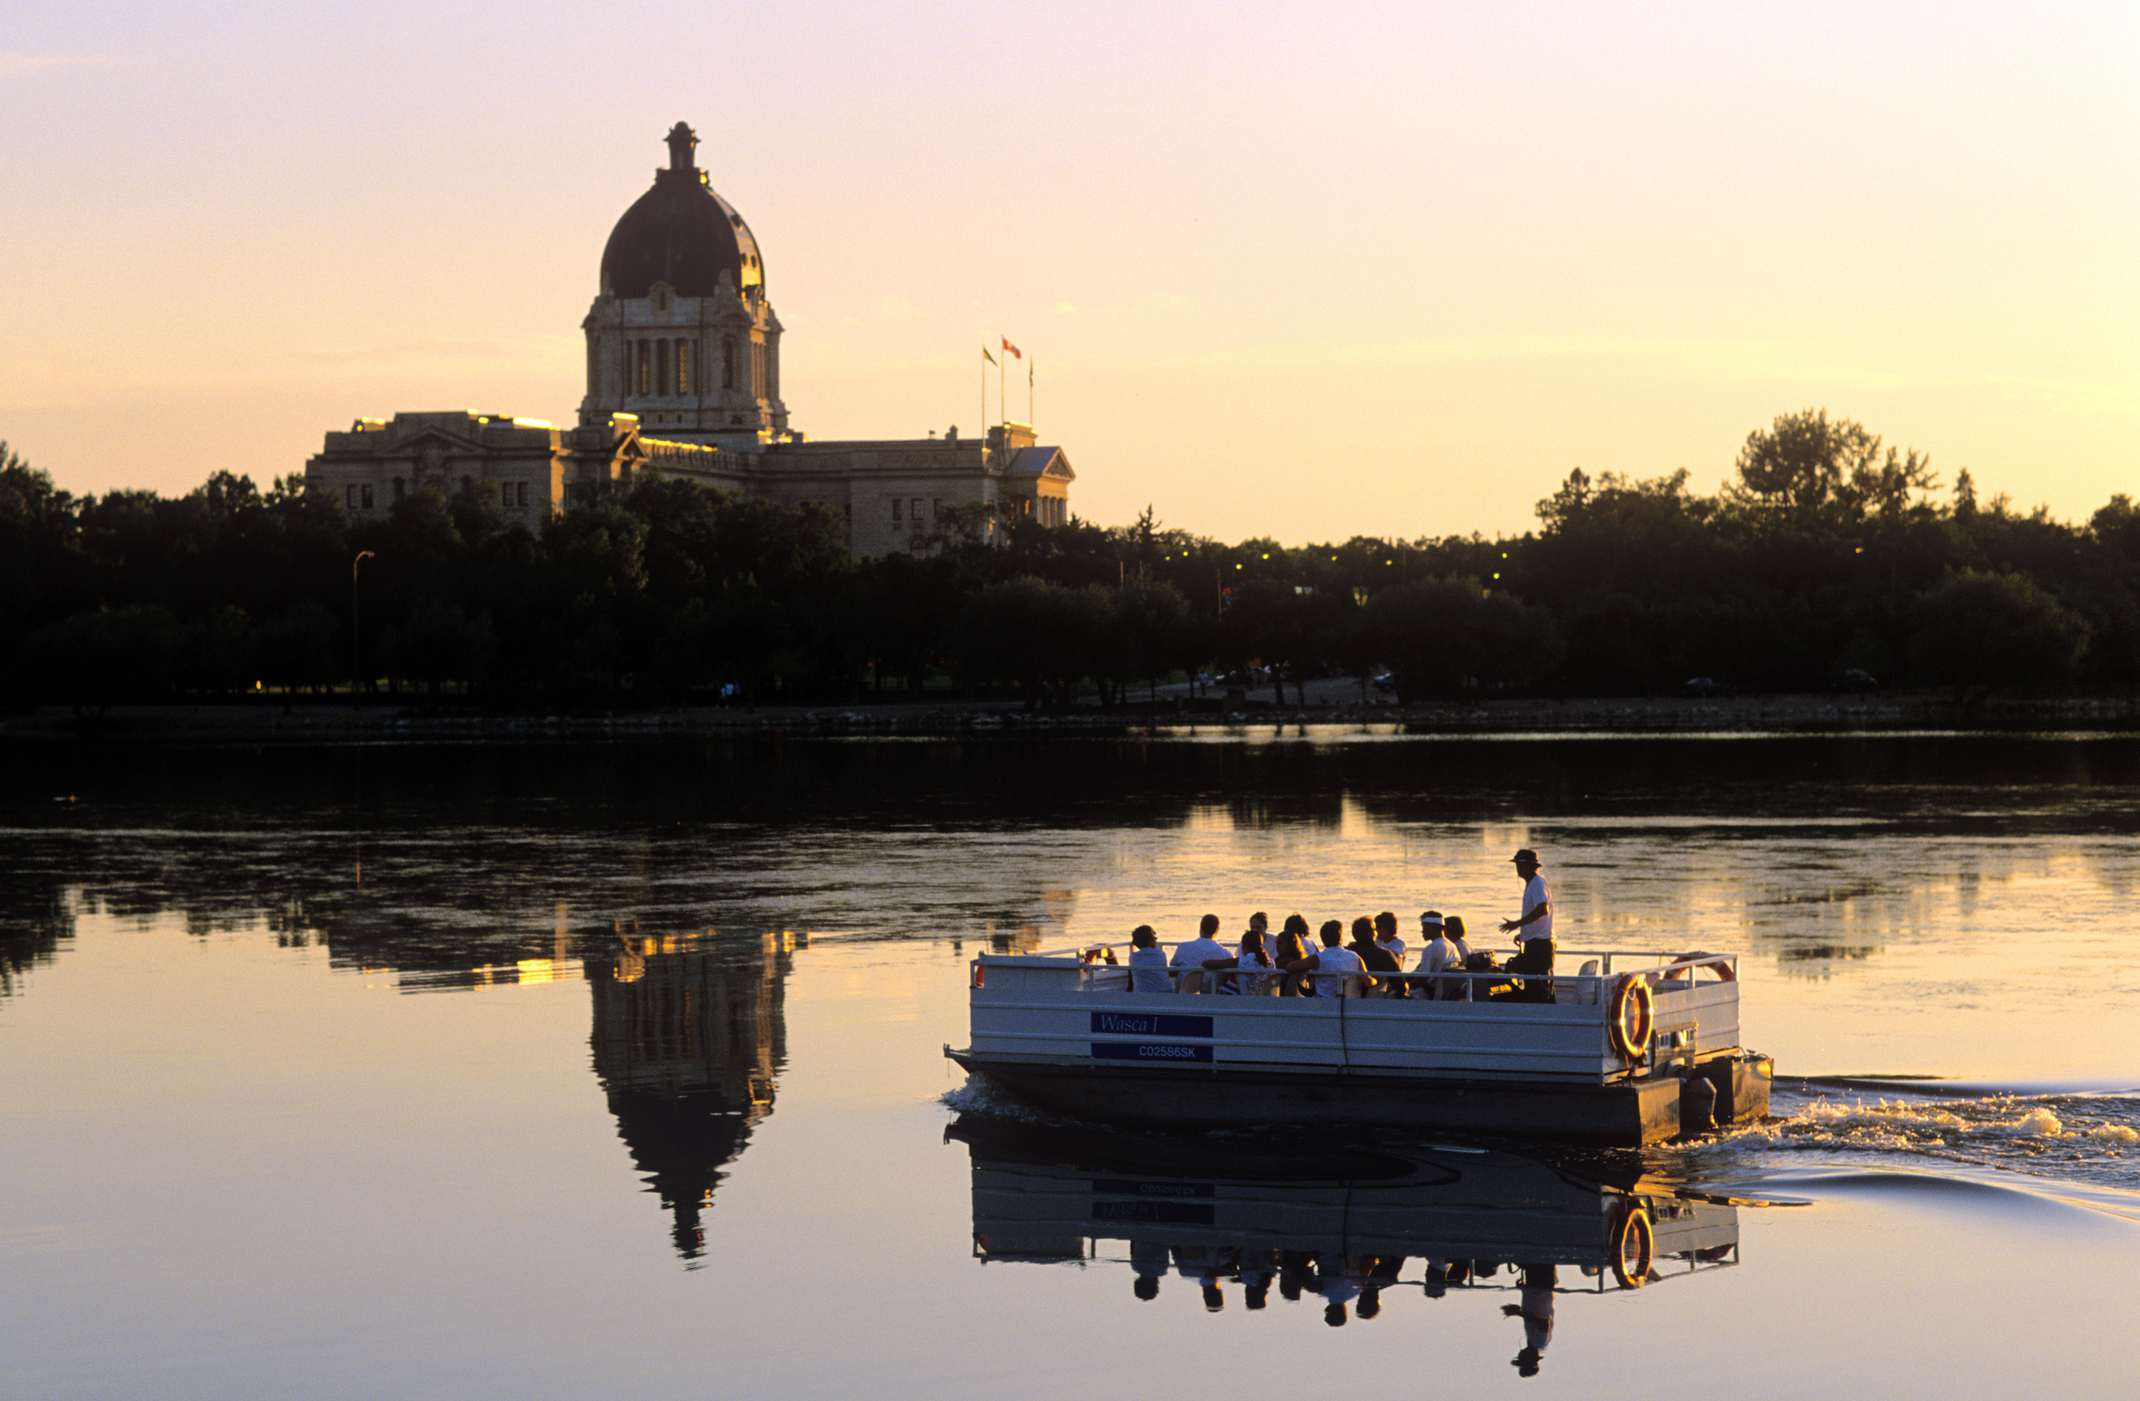 Boat Tour on Wascana Lake, Regina, Saskatchewan, Canada.